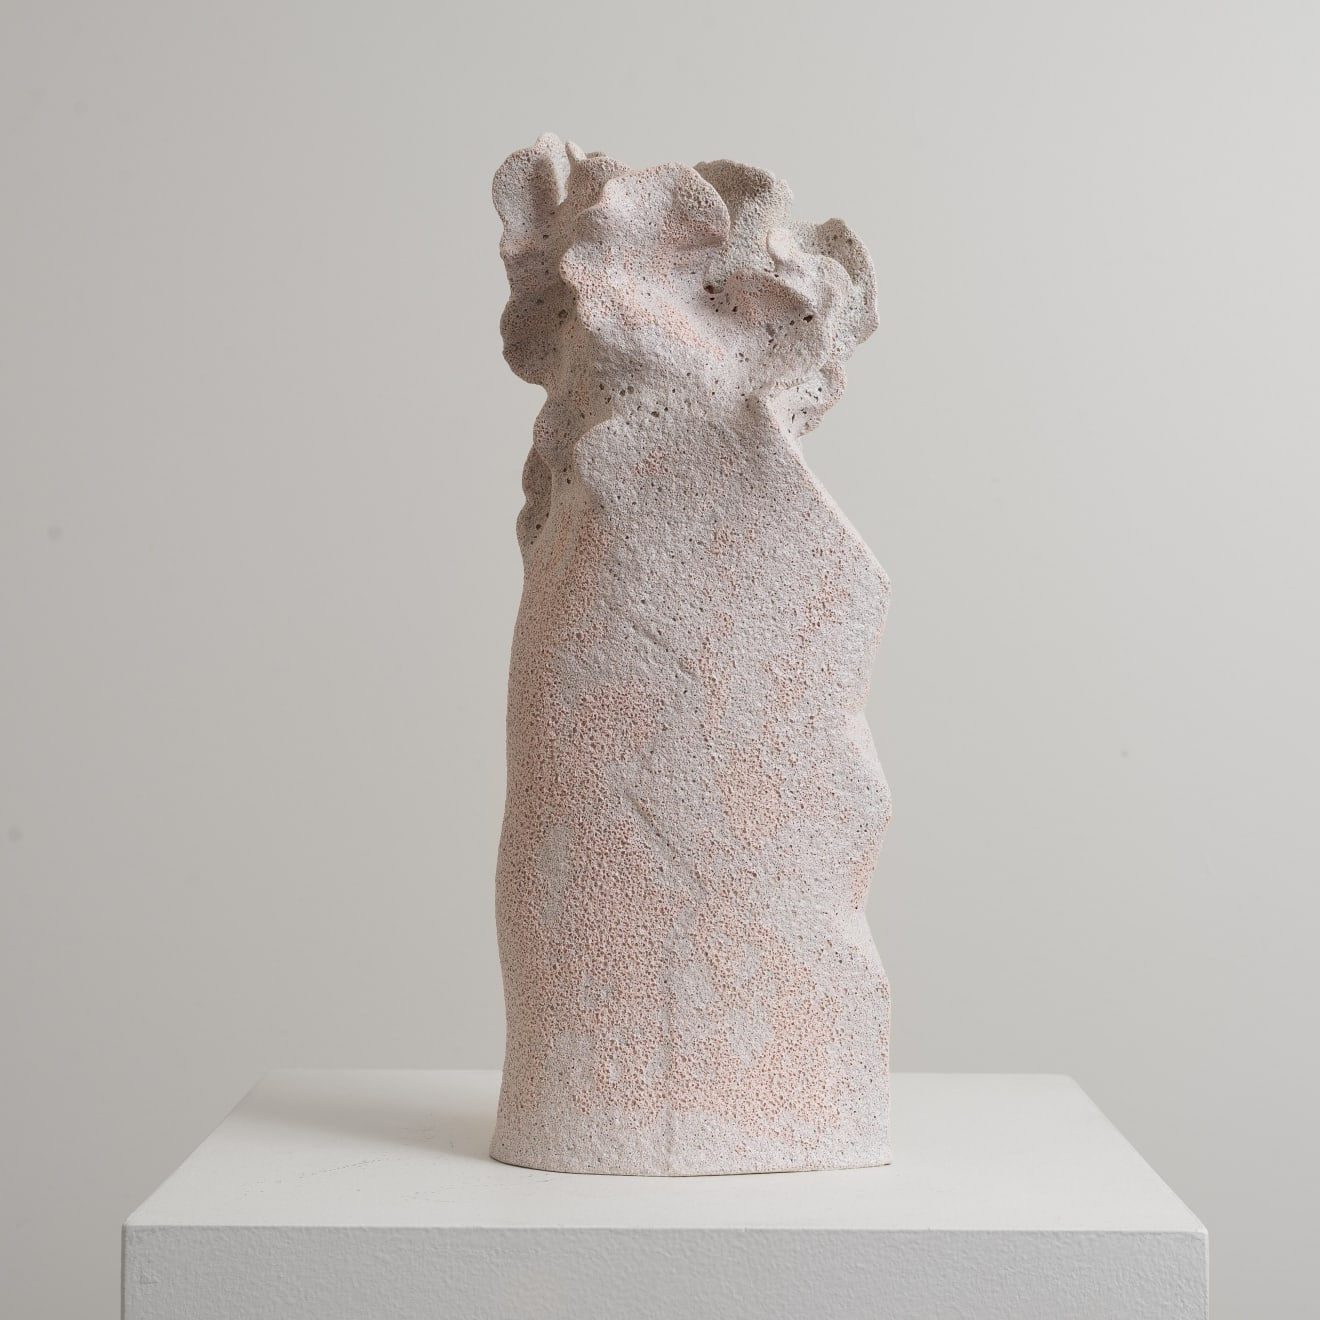 Bettina Willner-Browne Stacked Diamonds Hand-Built, Stoneware, Glaze Original 38 x 15 x 9cm $1400 £700